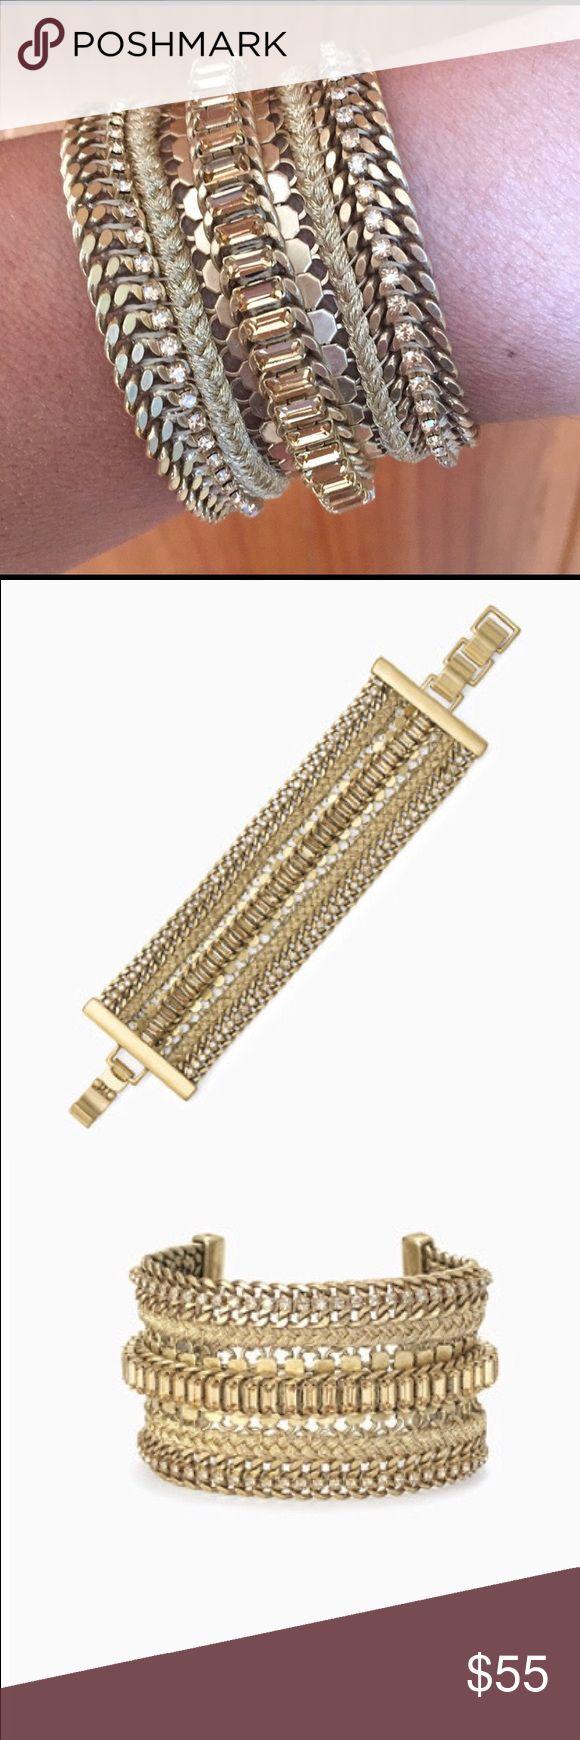 "Stella & Dot Philippa Bracelet Never worn!  New in box. Hand braided metallic thread joins dainty vintage gold chains. Vintage Gold Finish 8"" Length Fits Wrist Size SM-LG Clasp Closure Stella & Dot Jewelry Bracelets"